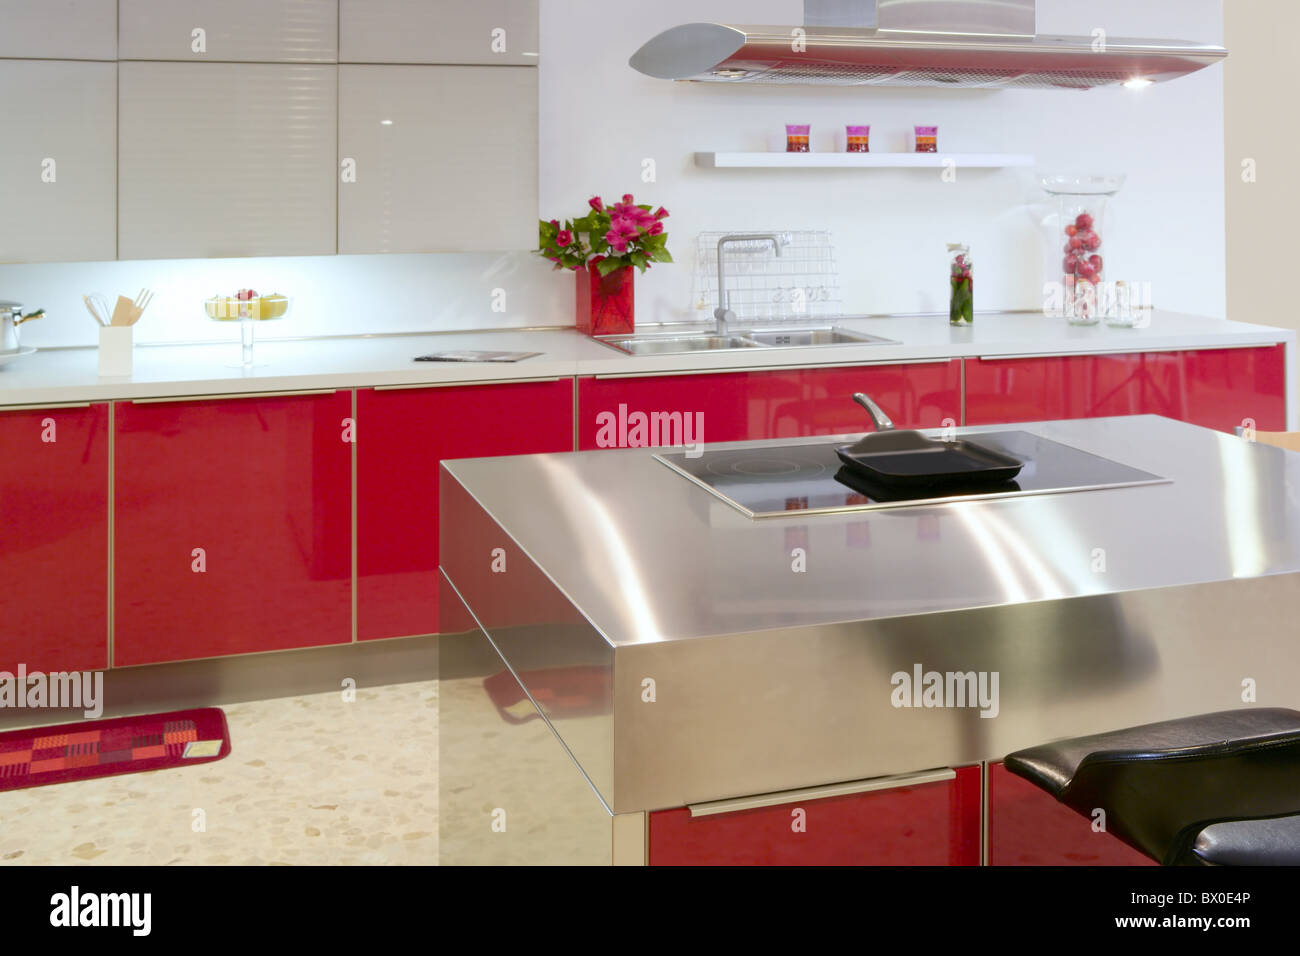 Isola Rossa cucina argento moderno interni casa architettura ...